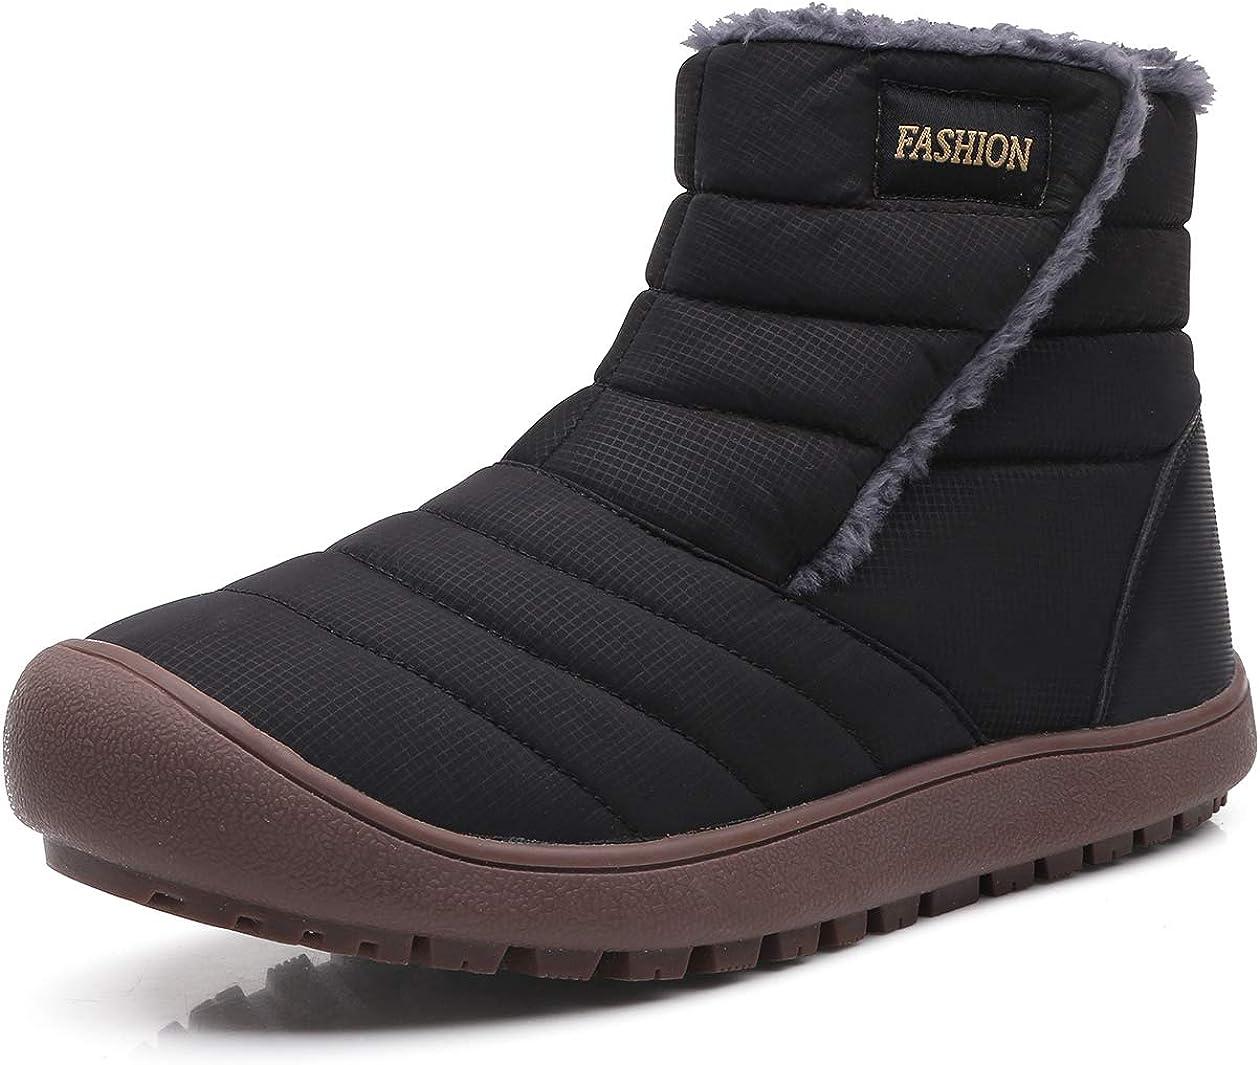 Cheap Snow Boots For Men